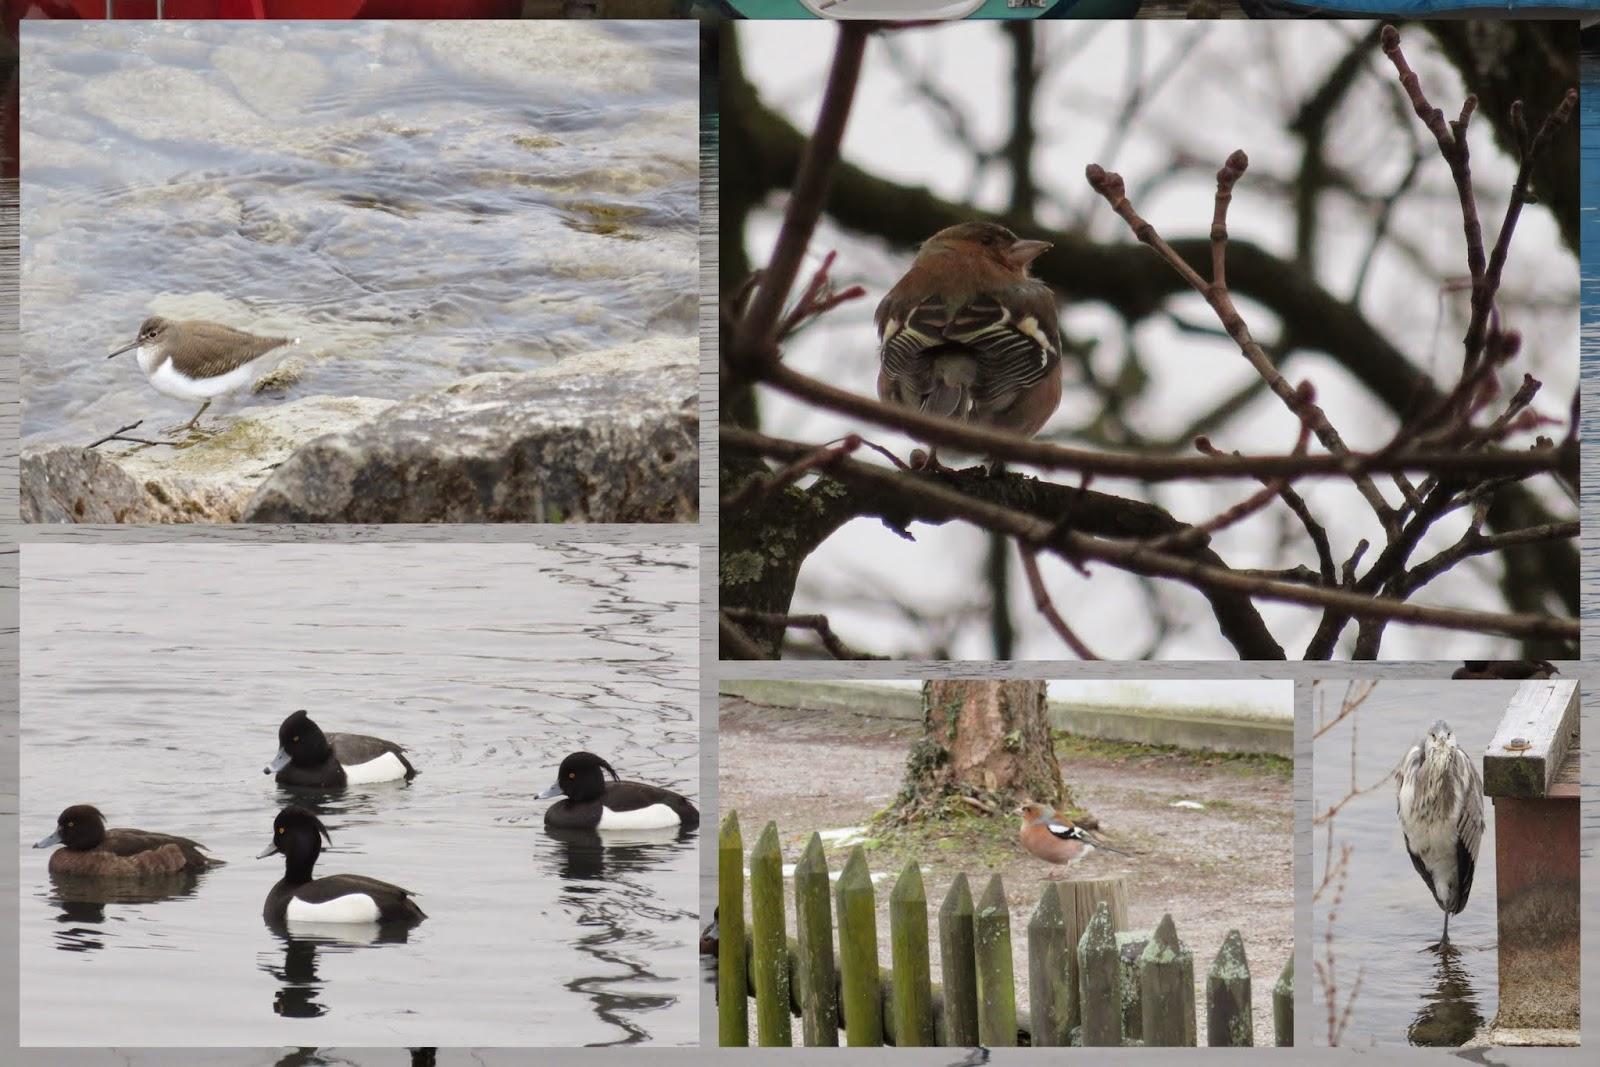 sandpiper, chaffinch, tufted ducks, and heron on Zurich See